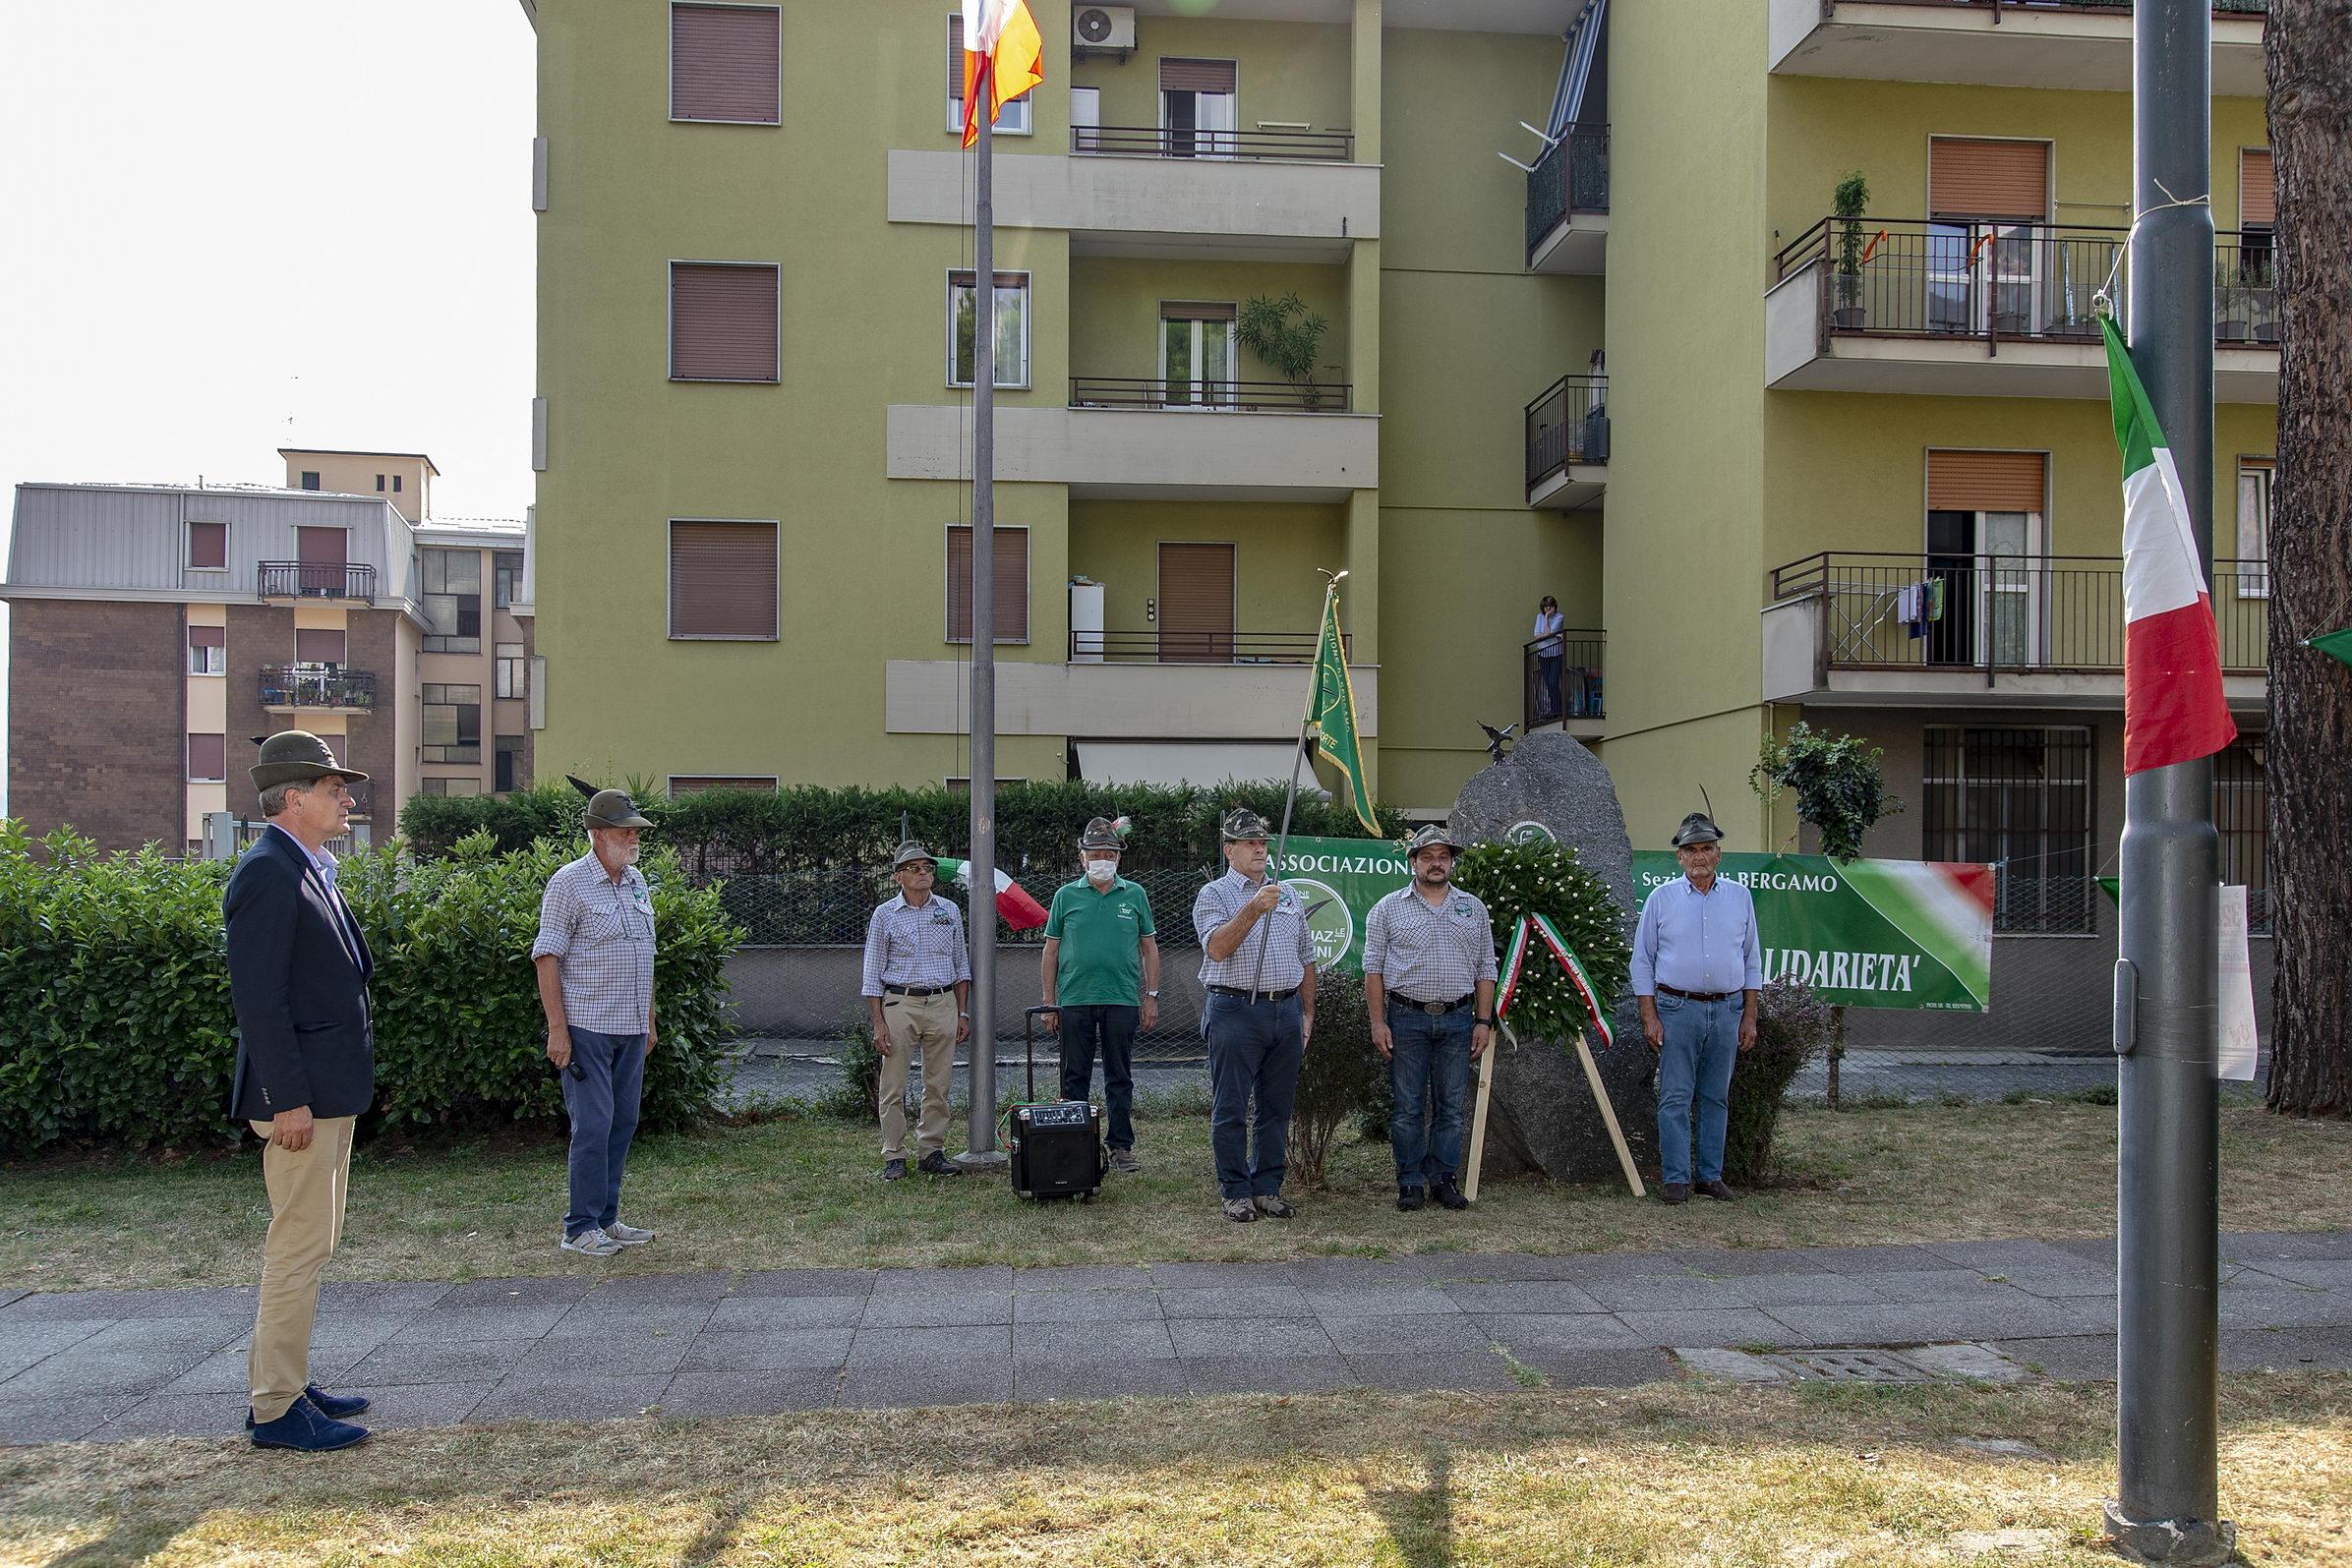 Alpini Calolziocorte taragnata centenario